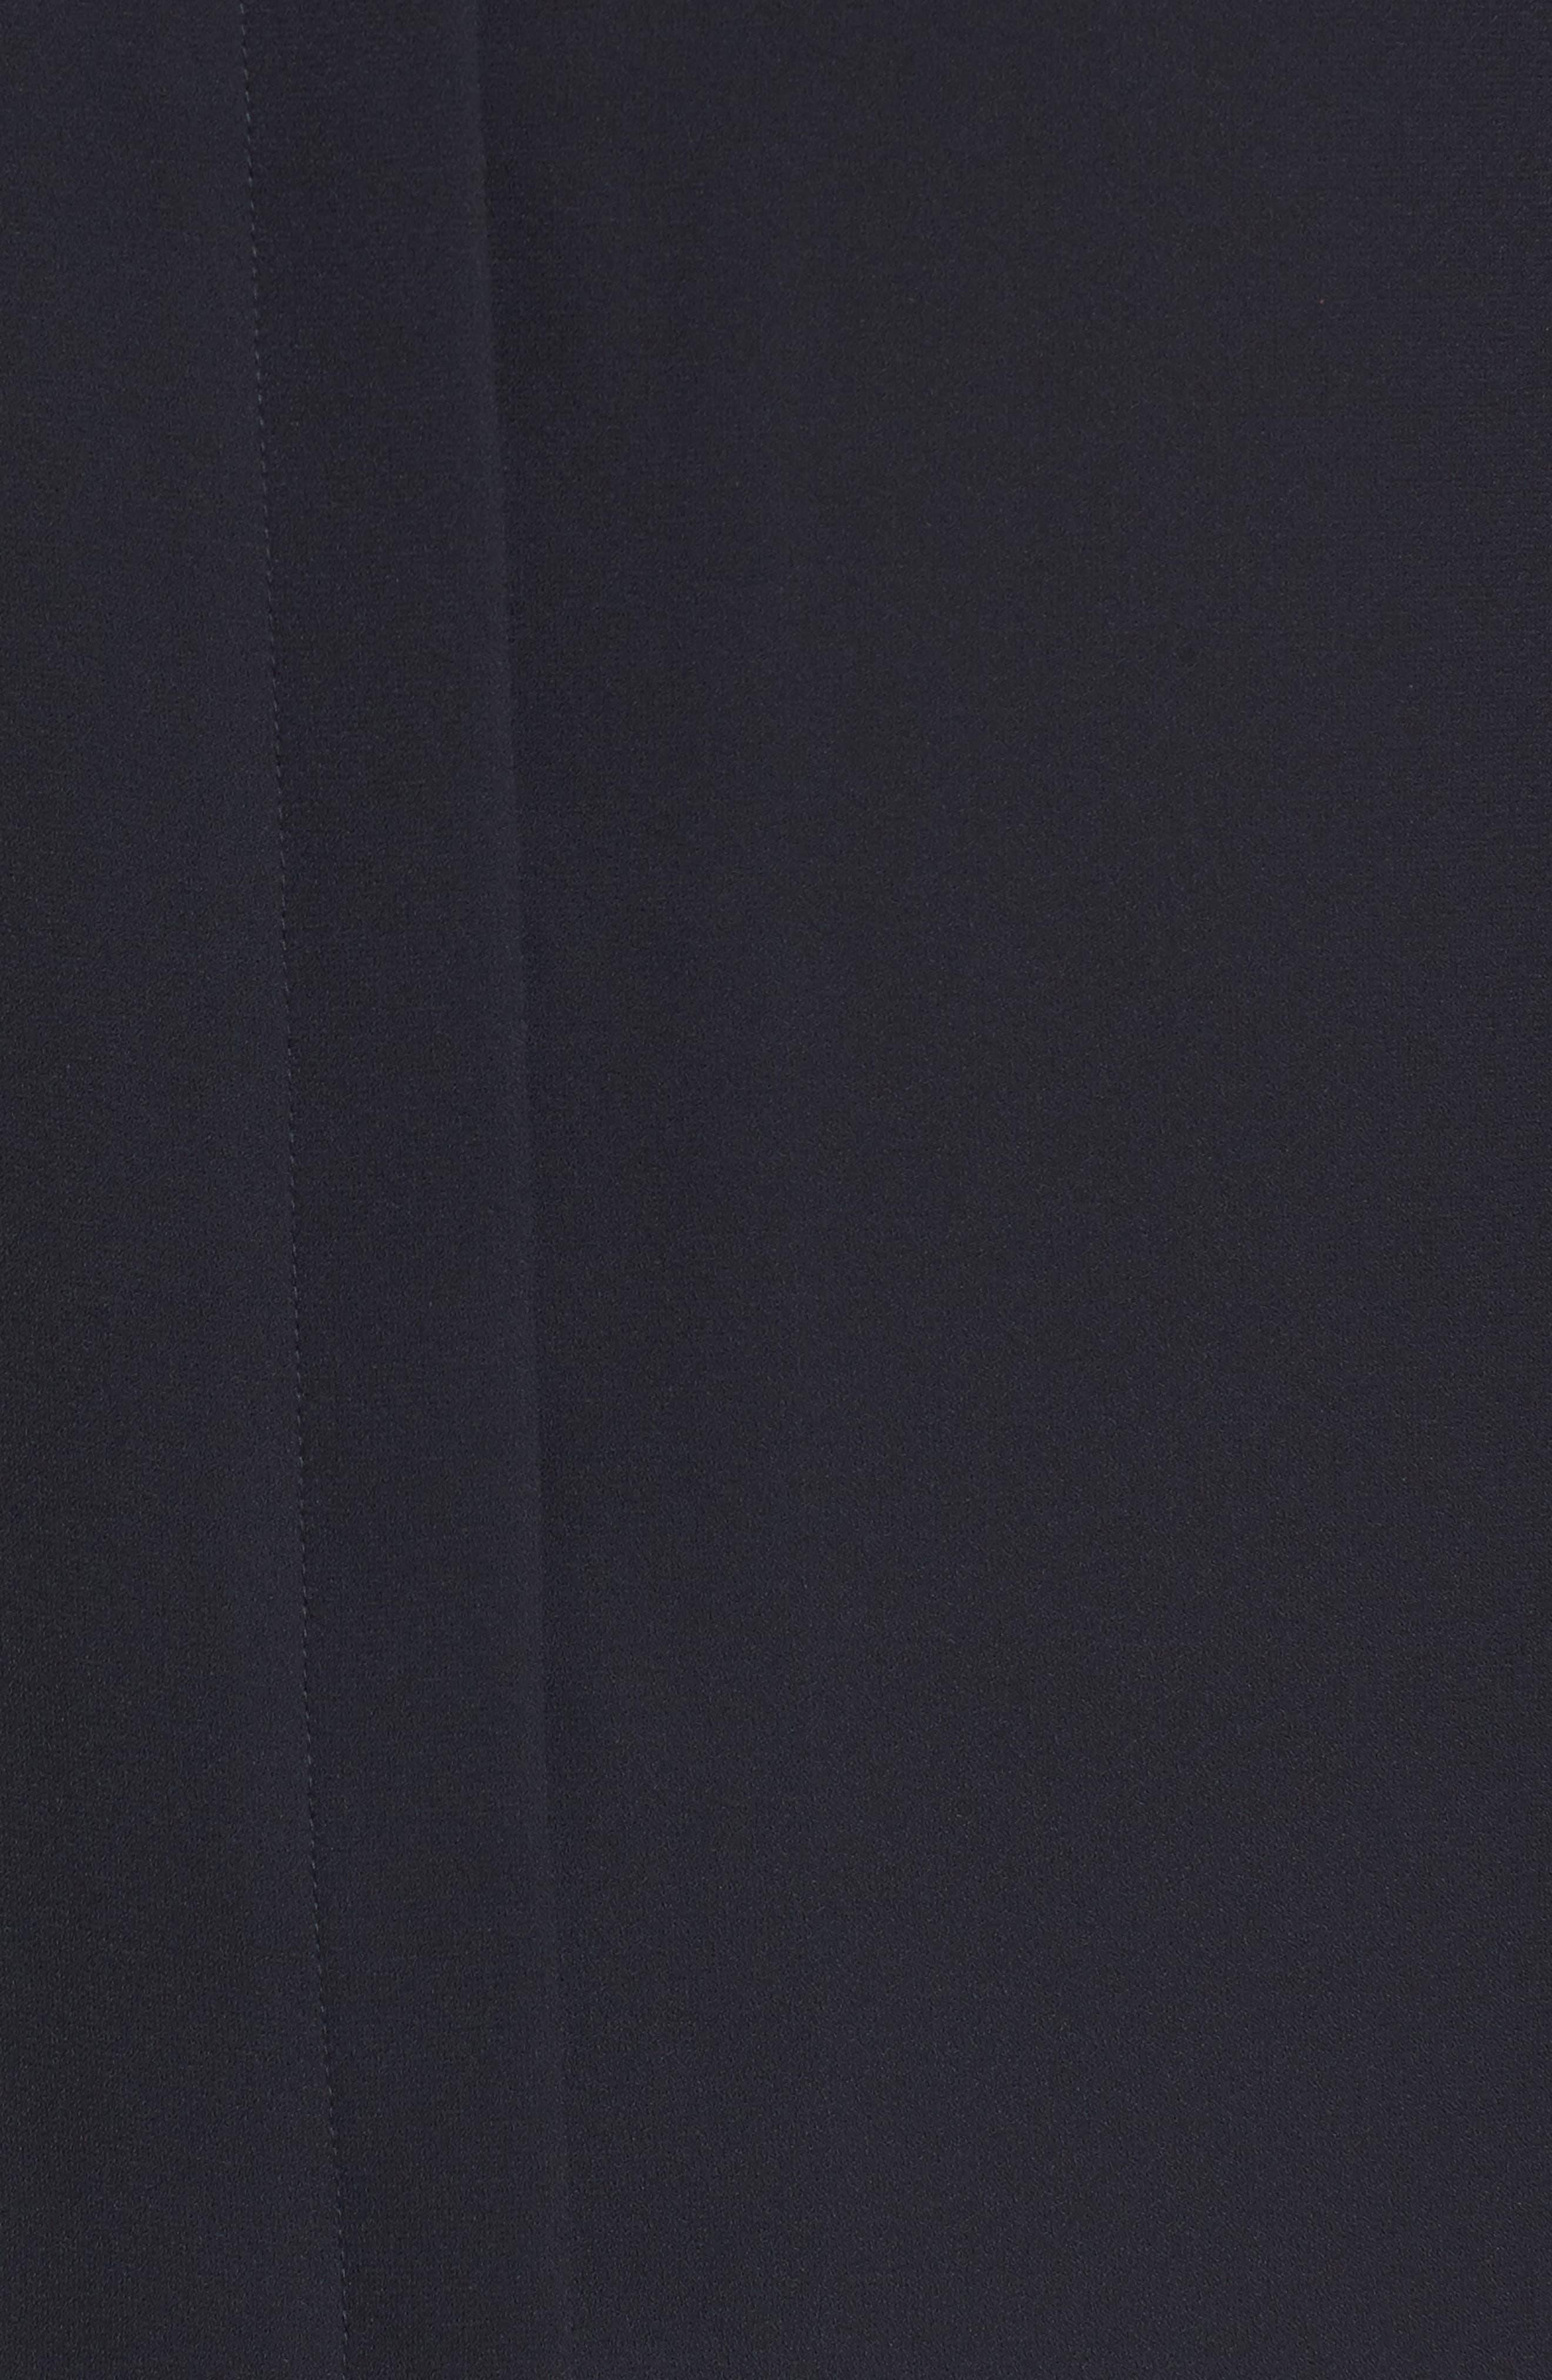 Split Collar Stripe Sleeve Blouse,                             Alternate thumbnail 5, color,                             Black